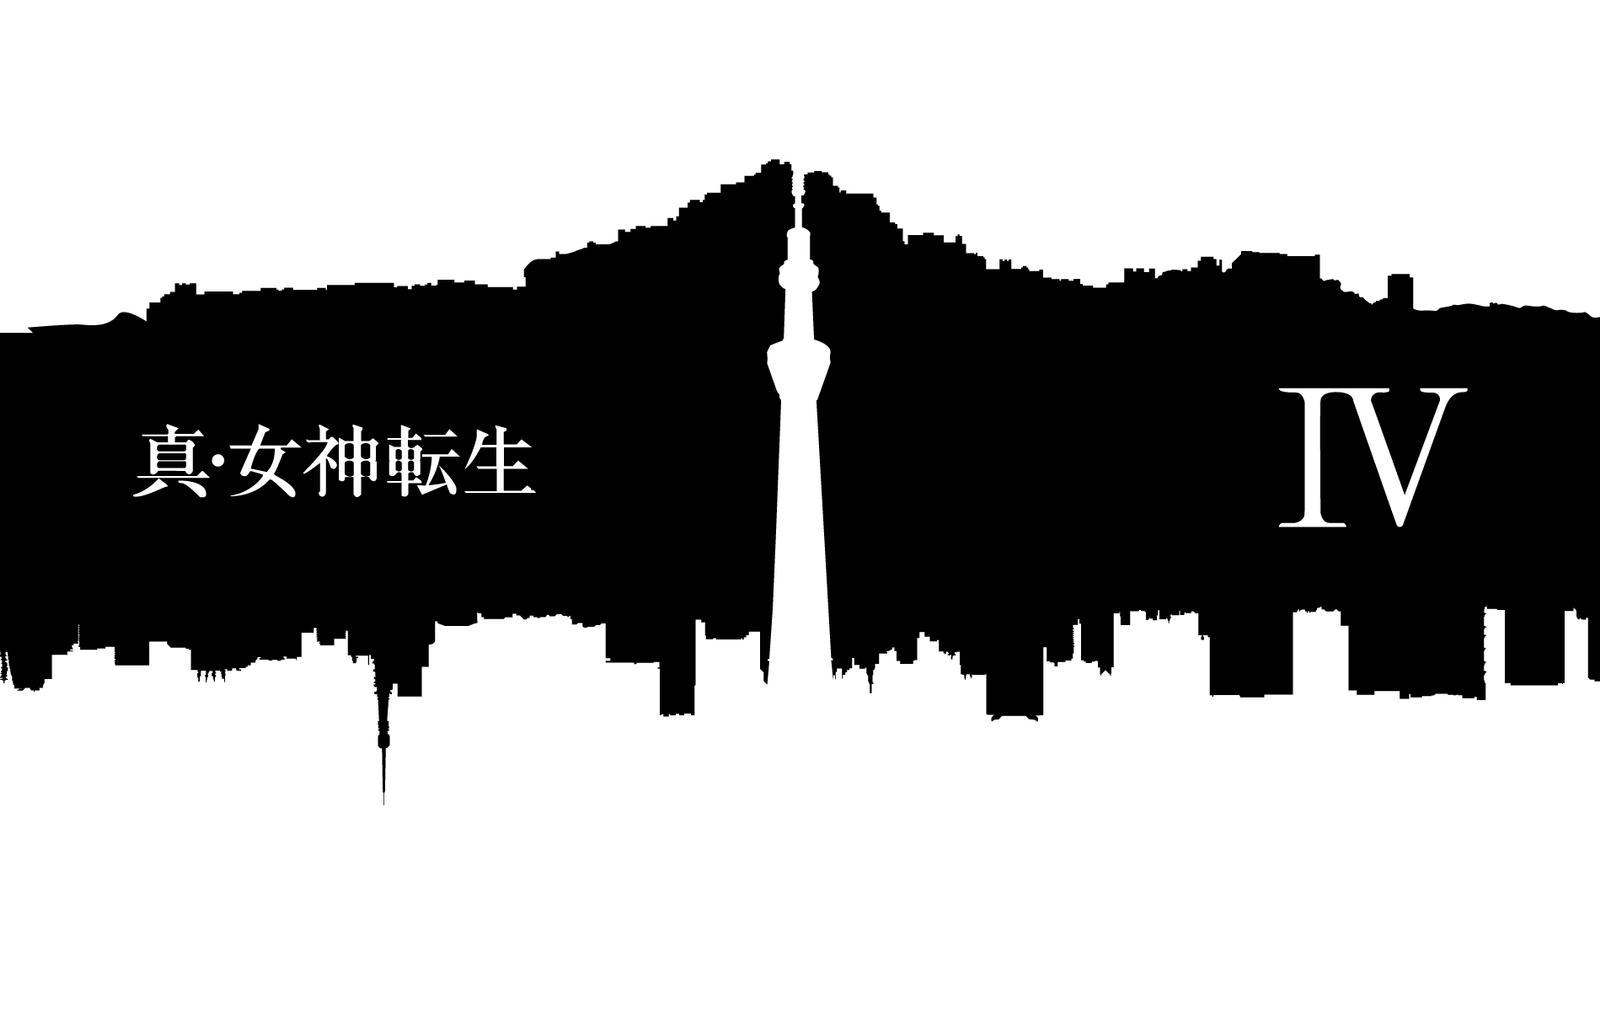 Shin Megami Tensei Iv Wallpaper By Telosombre On Deviantart